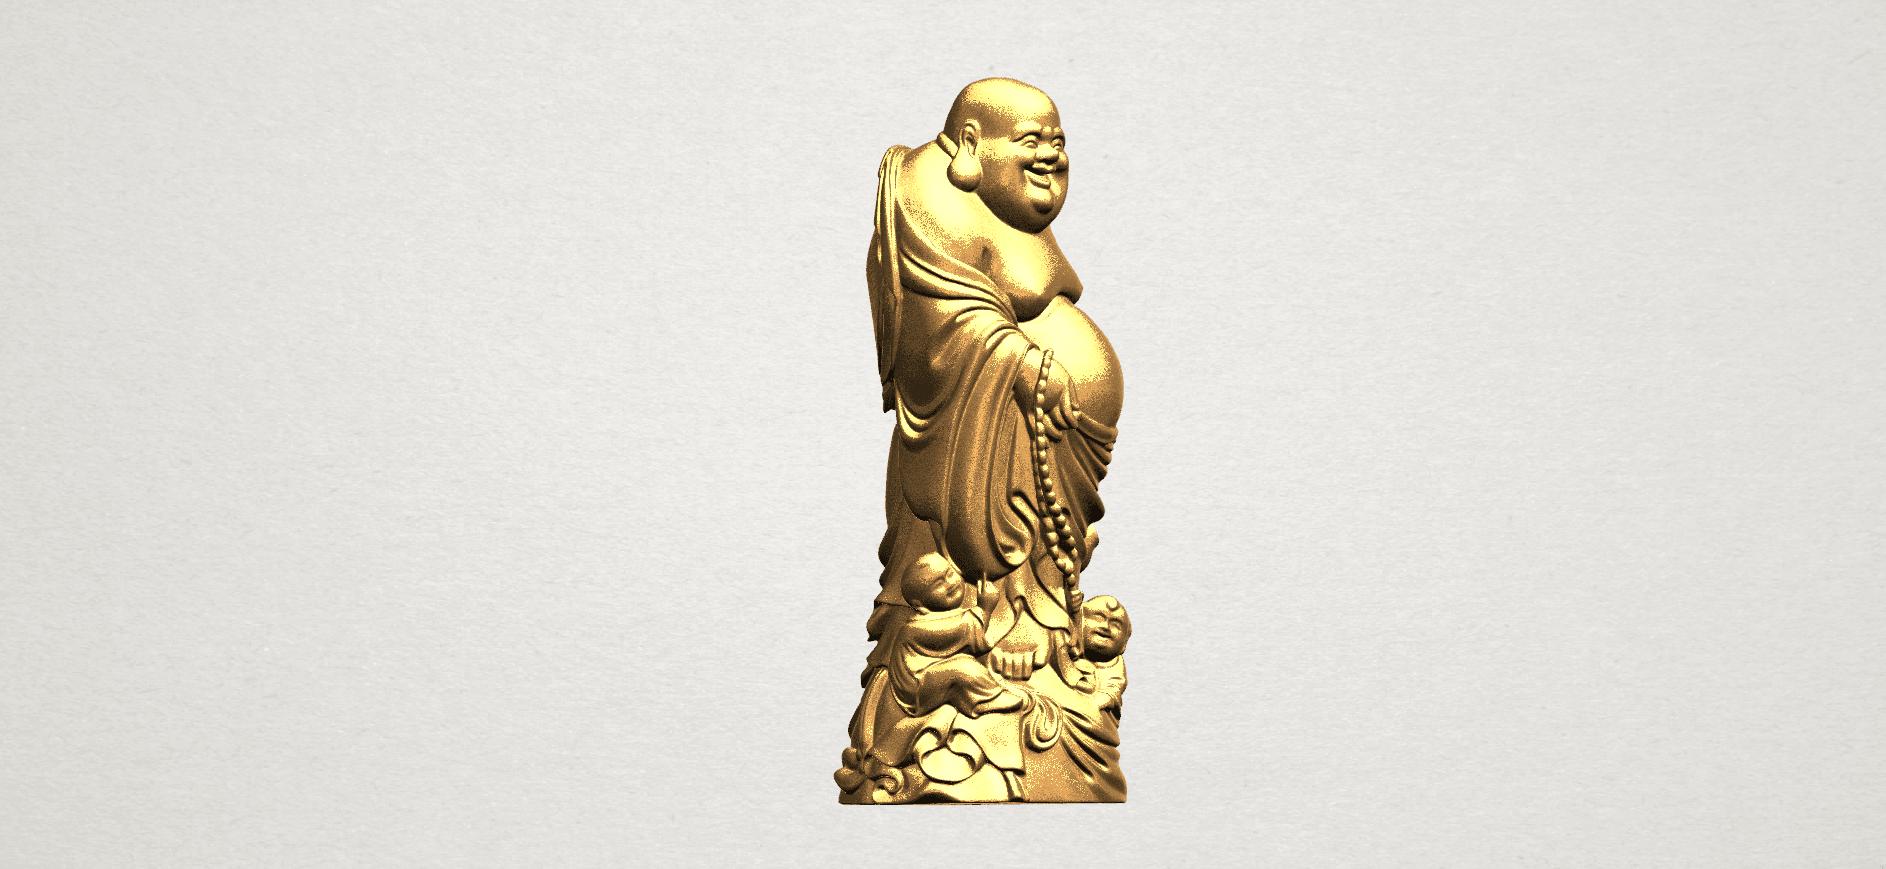 TDA0070 Metteyya Buddha 03 - 88mm - A08.png Download free STL file Metteyya Buddha 03 • 3D printing object, GeorgesNikkei